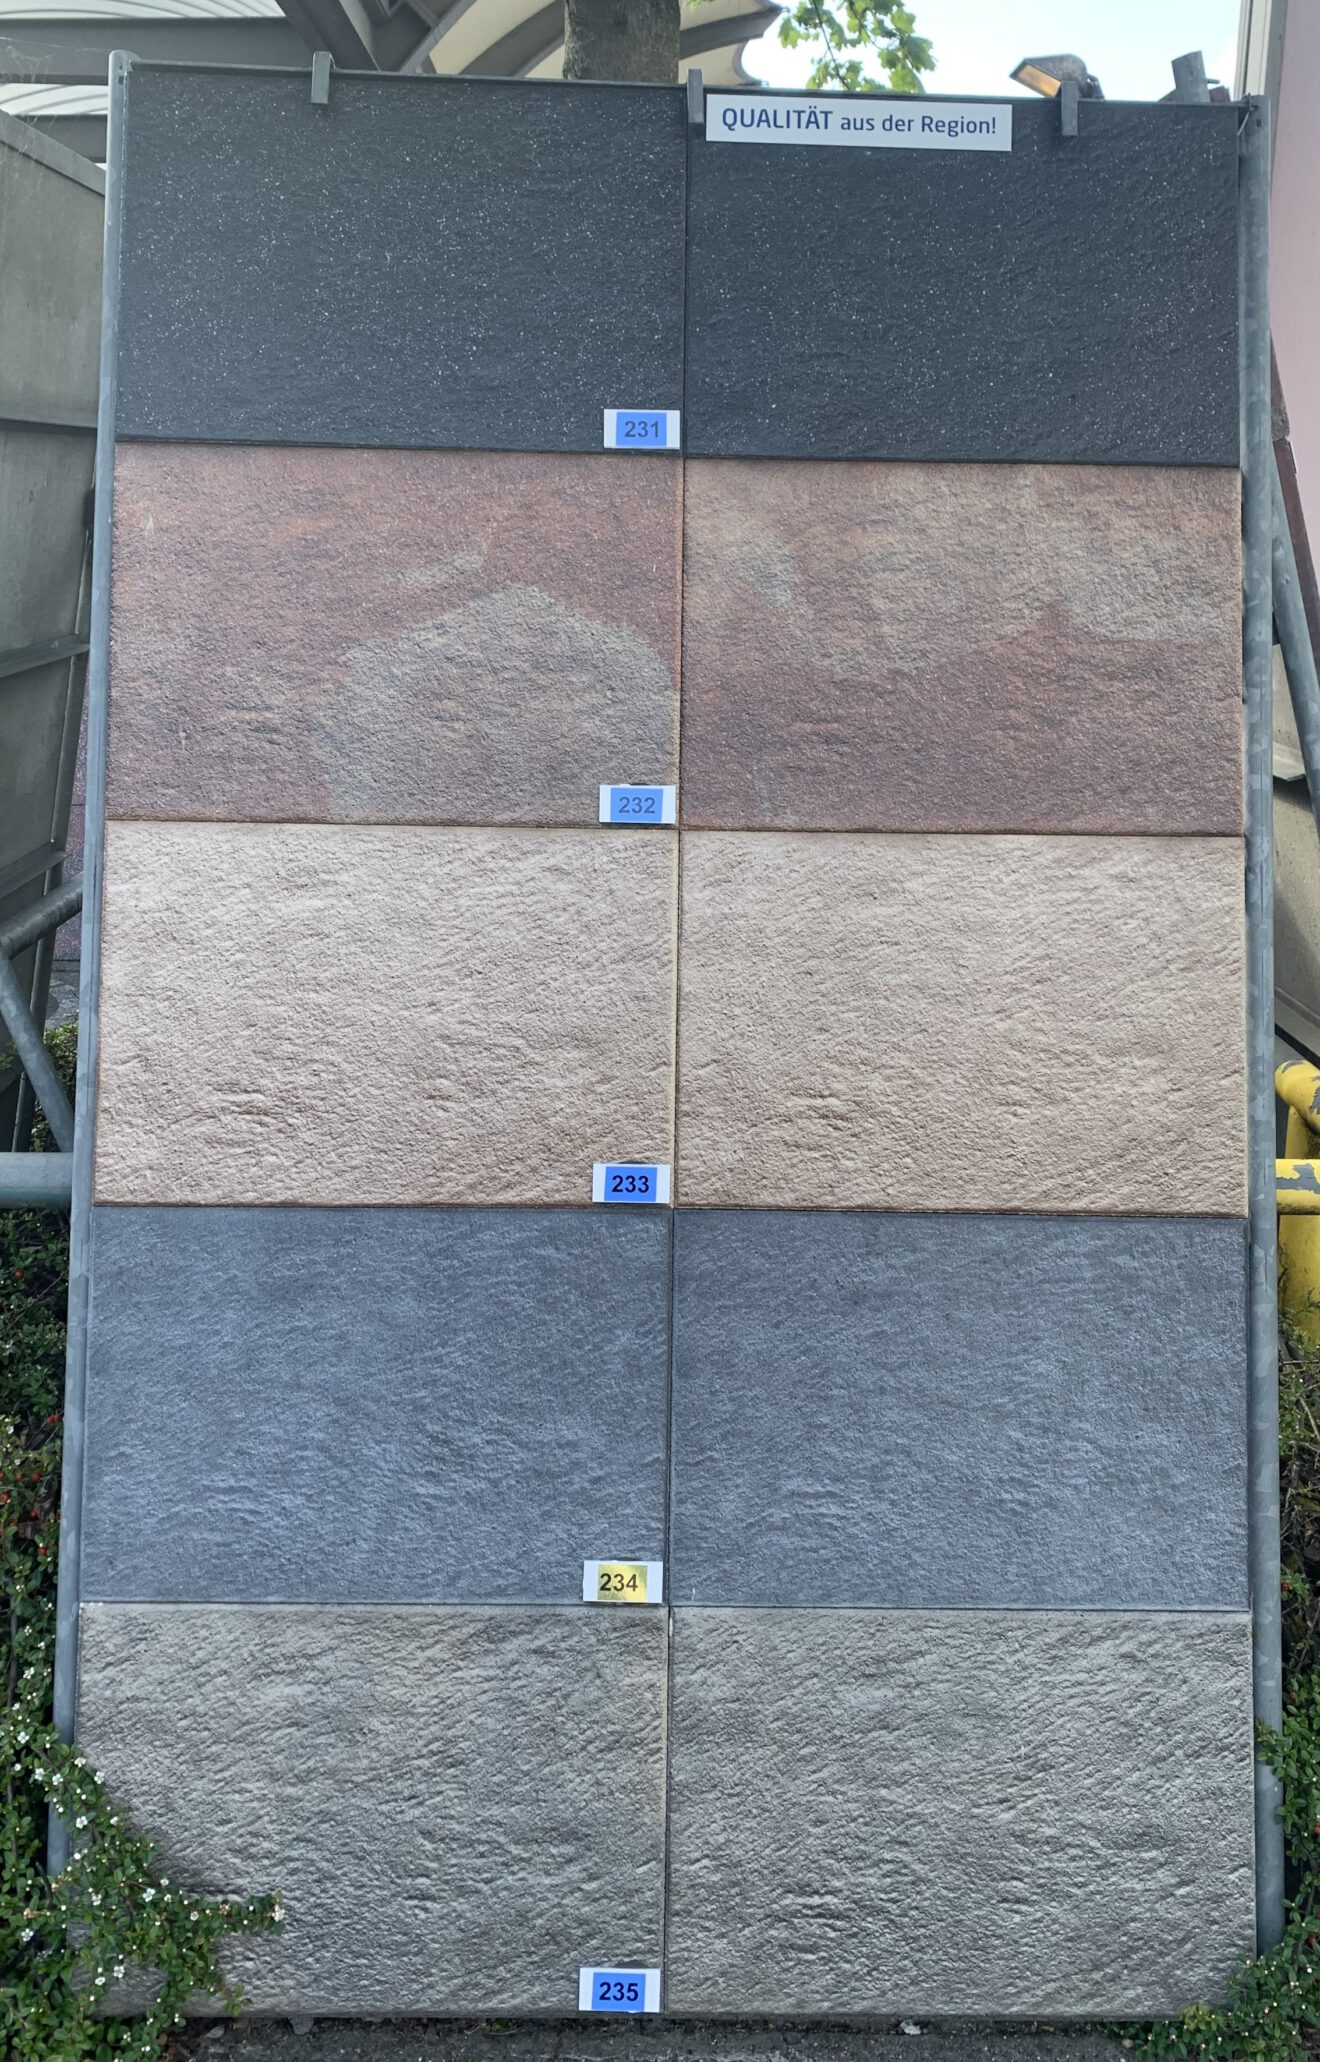 Gartenplatte Novaclean Washington bei Stolzenbach Baustoffe in Bremen kaufen